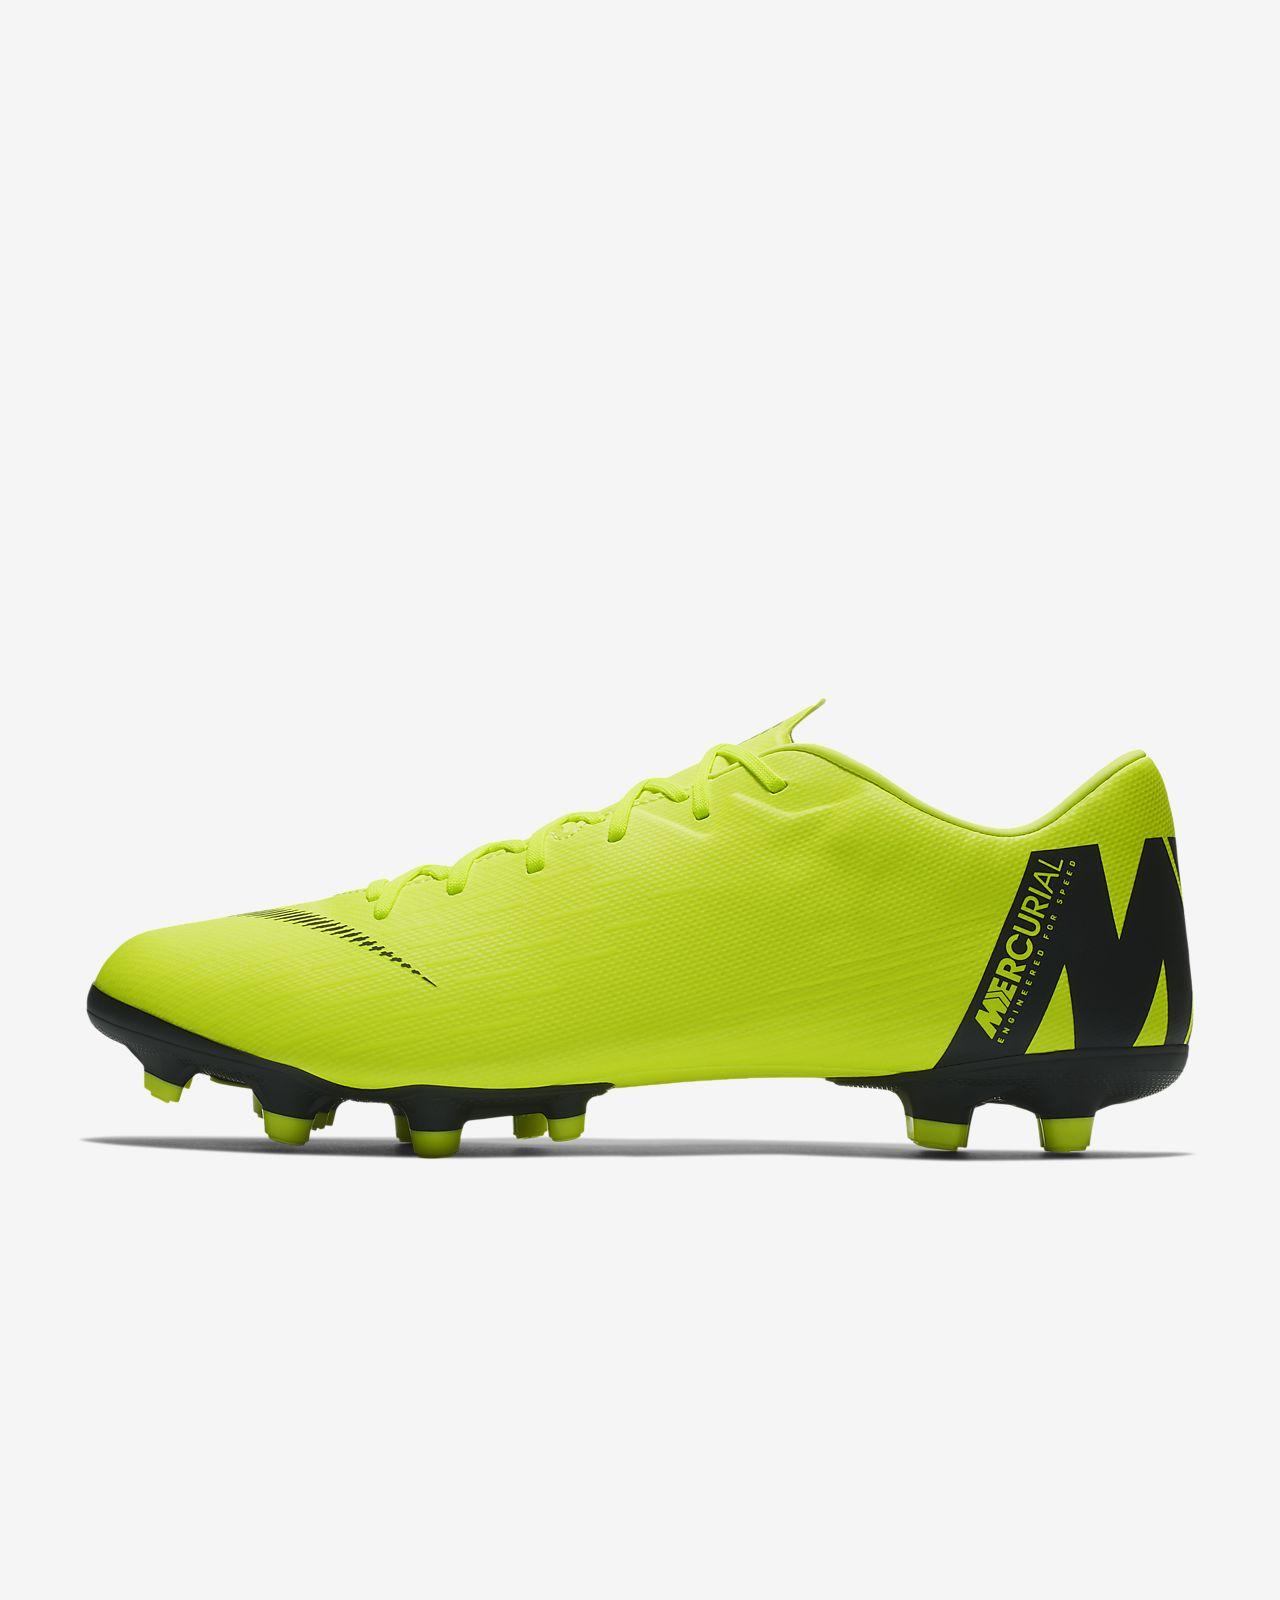 00501db529c02 Nike Vapor 12 Academy MG Botas de fútbol para múltiples superficies ...